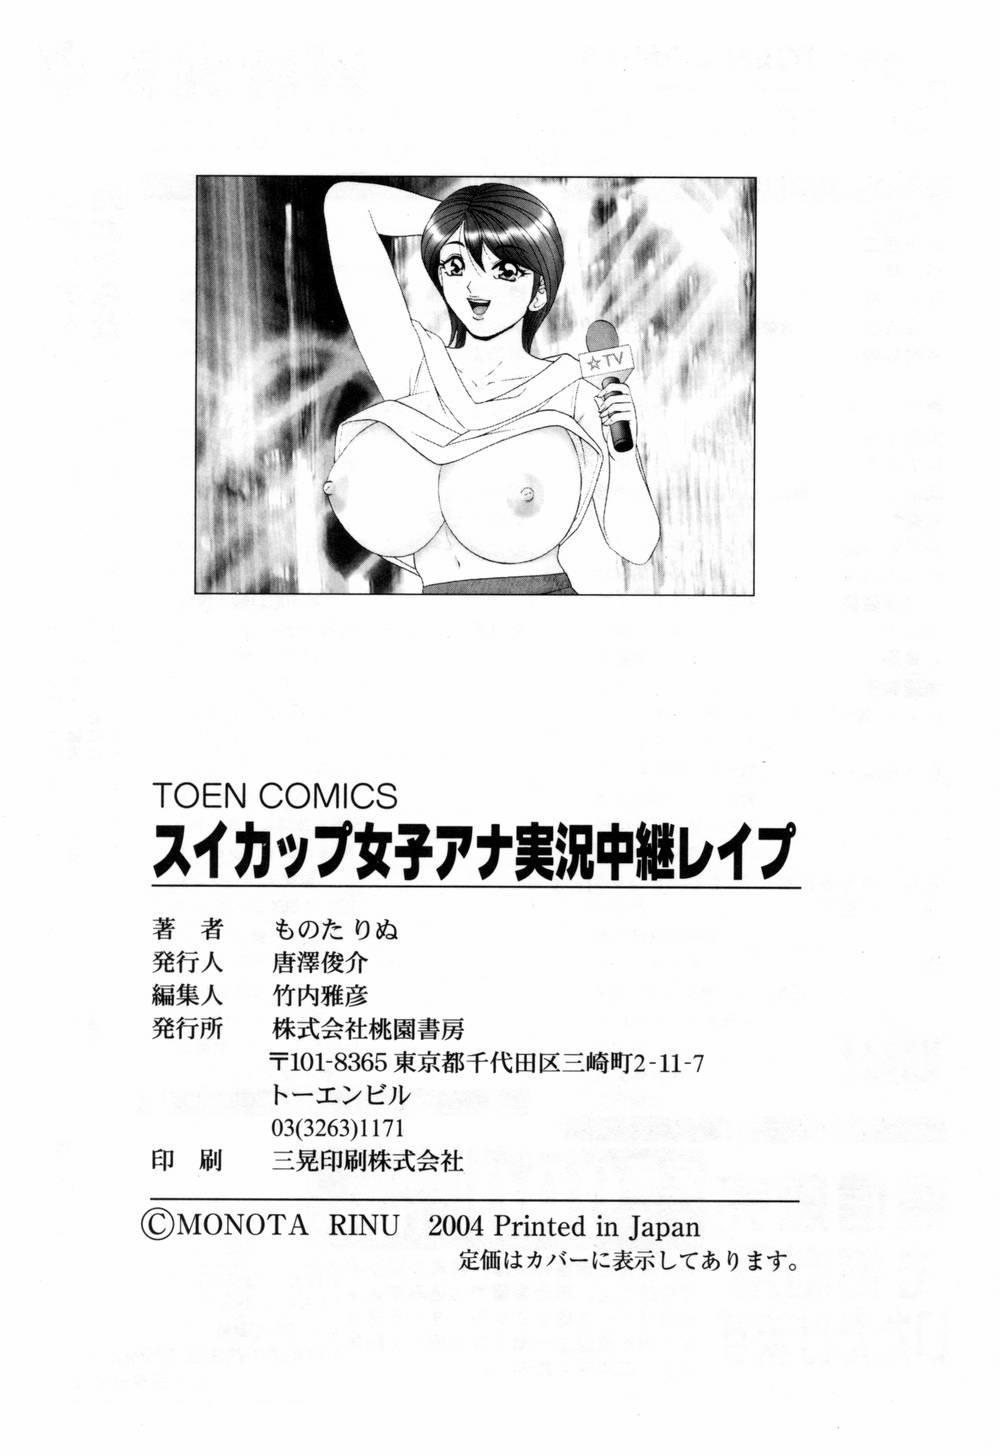 SuiCup Joshi Announcer Jikkyo Chukei Rape 174